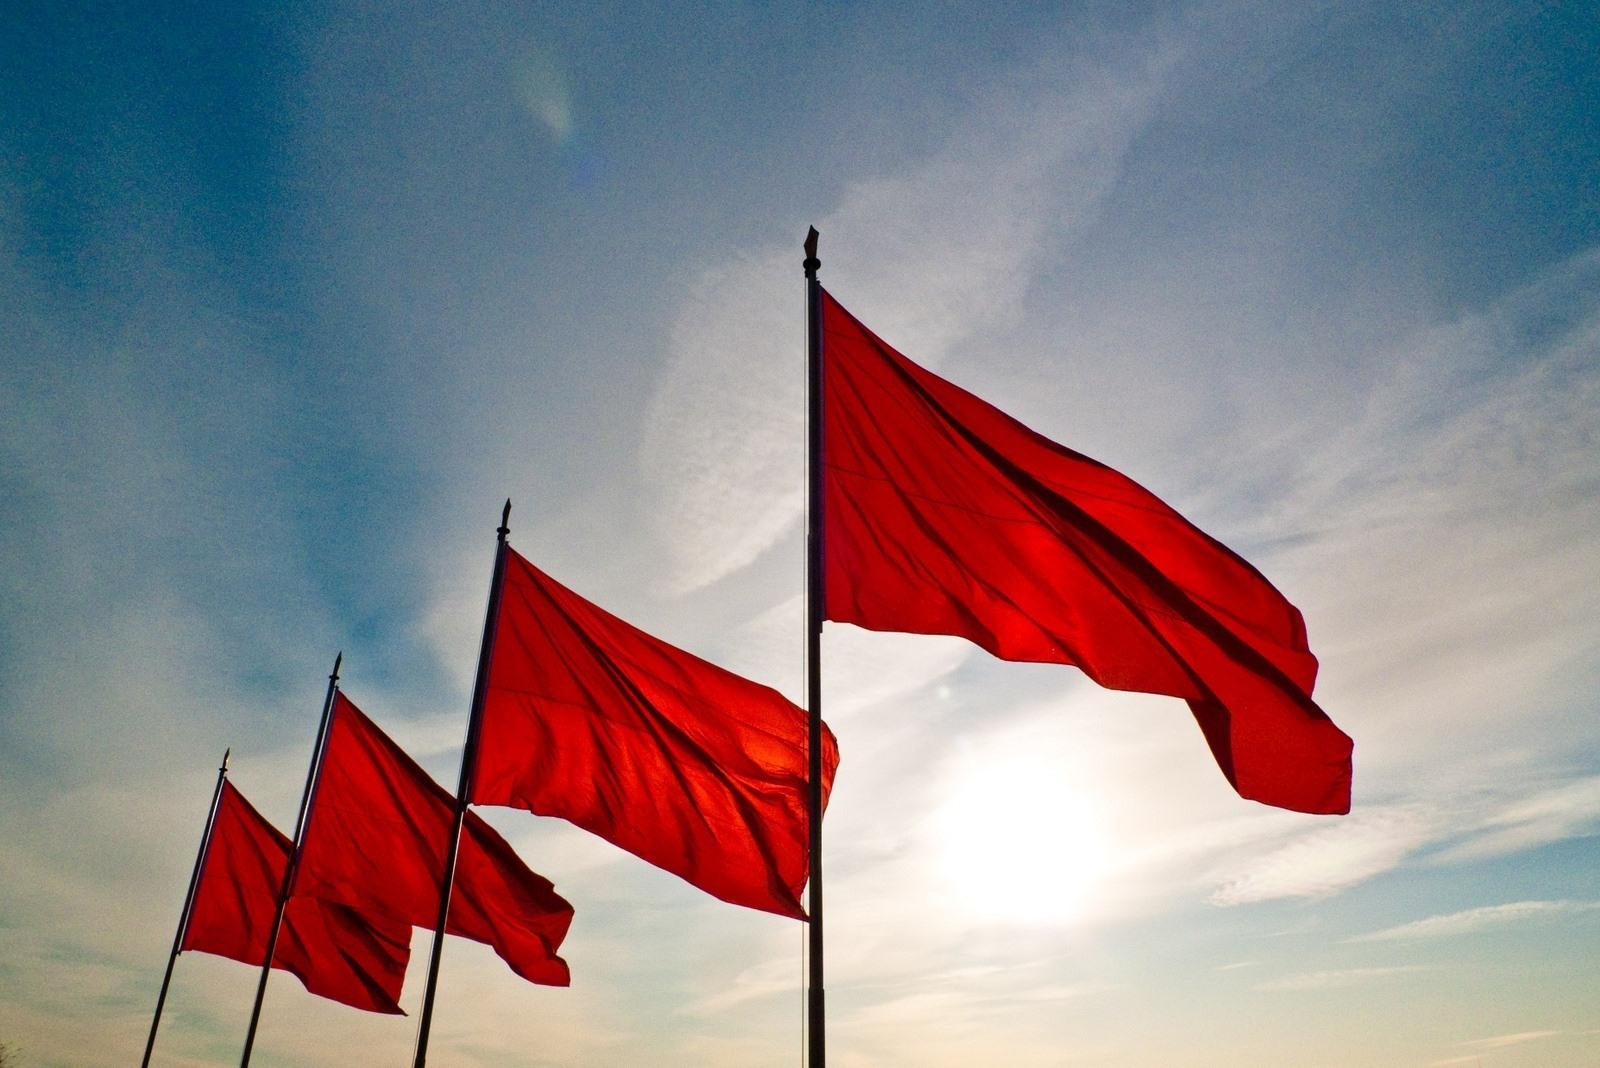 red-flag-alert